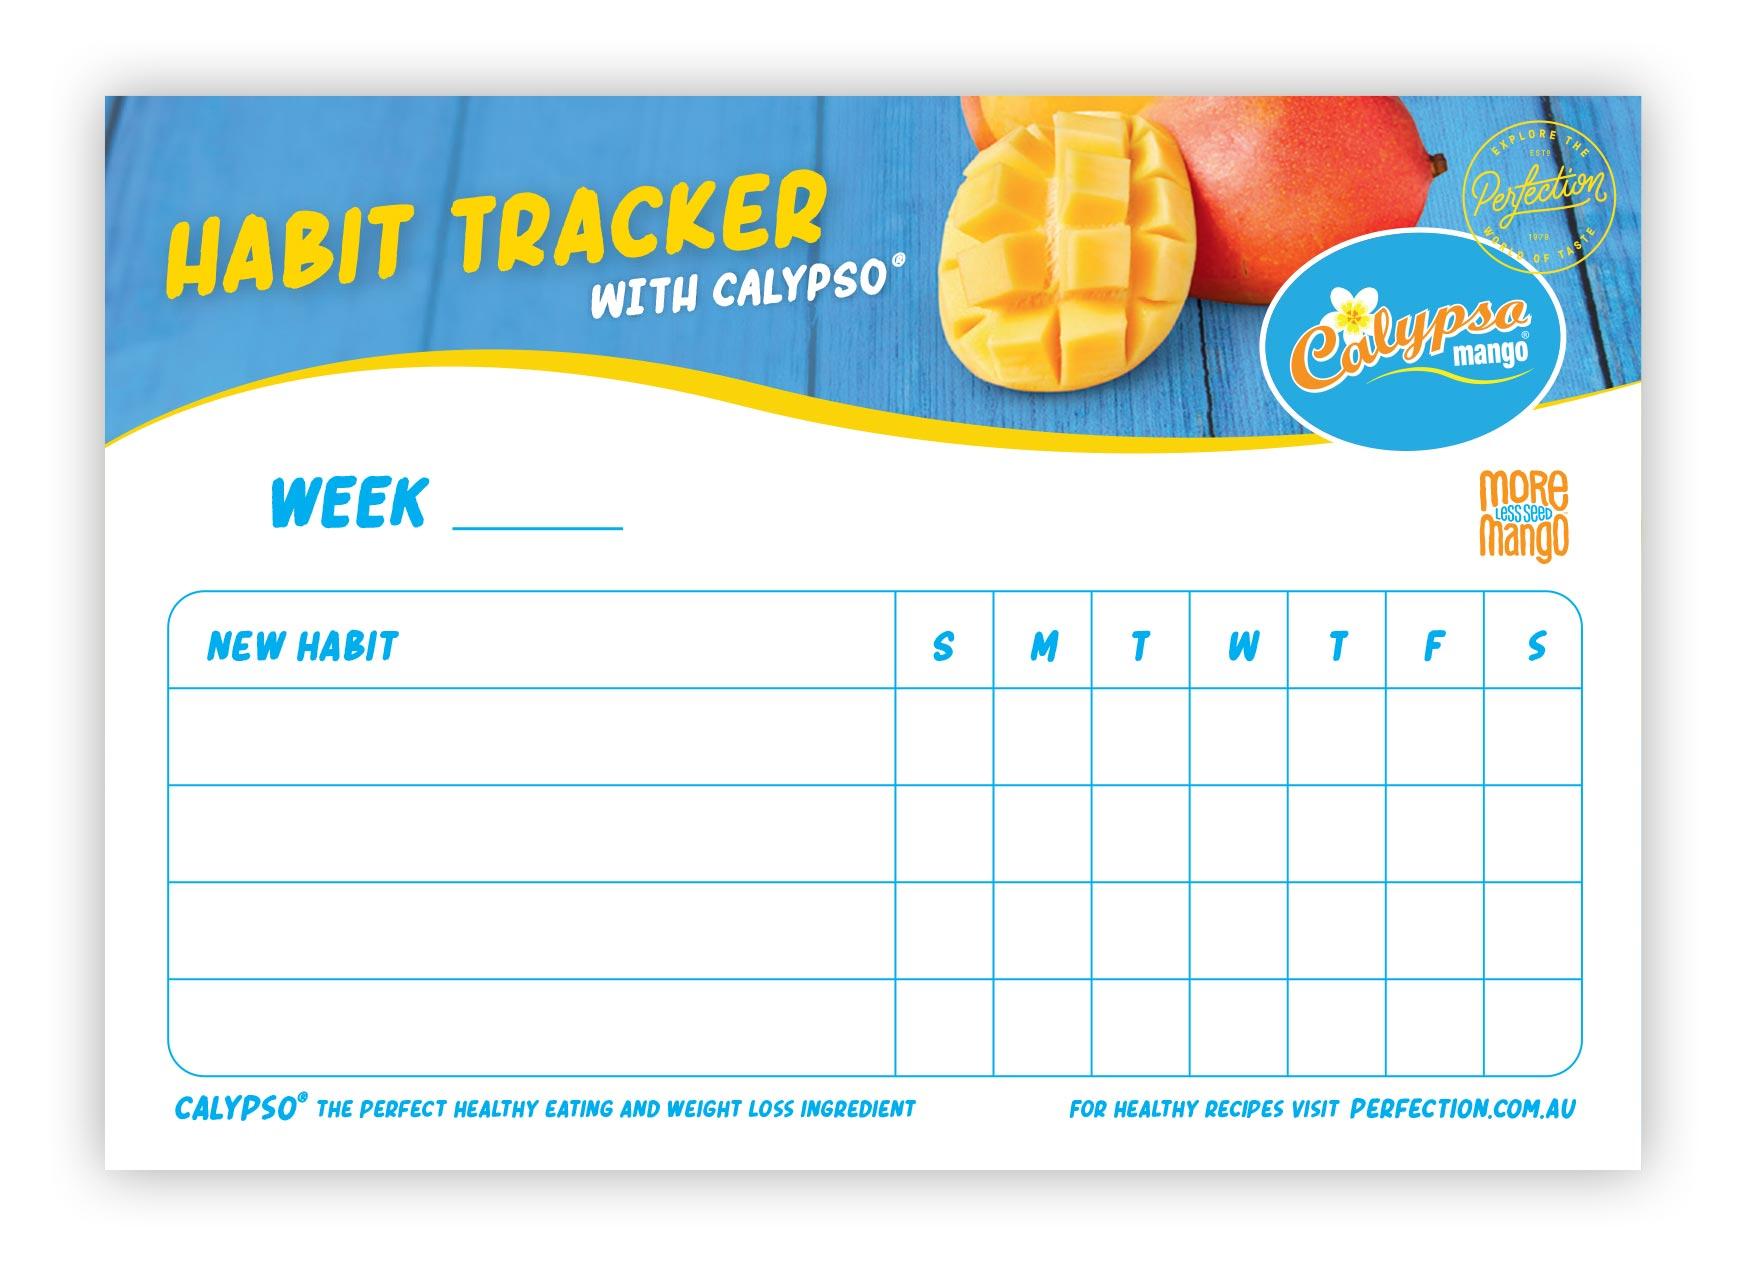 Calypso Mango Habit Tracker